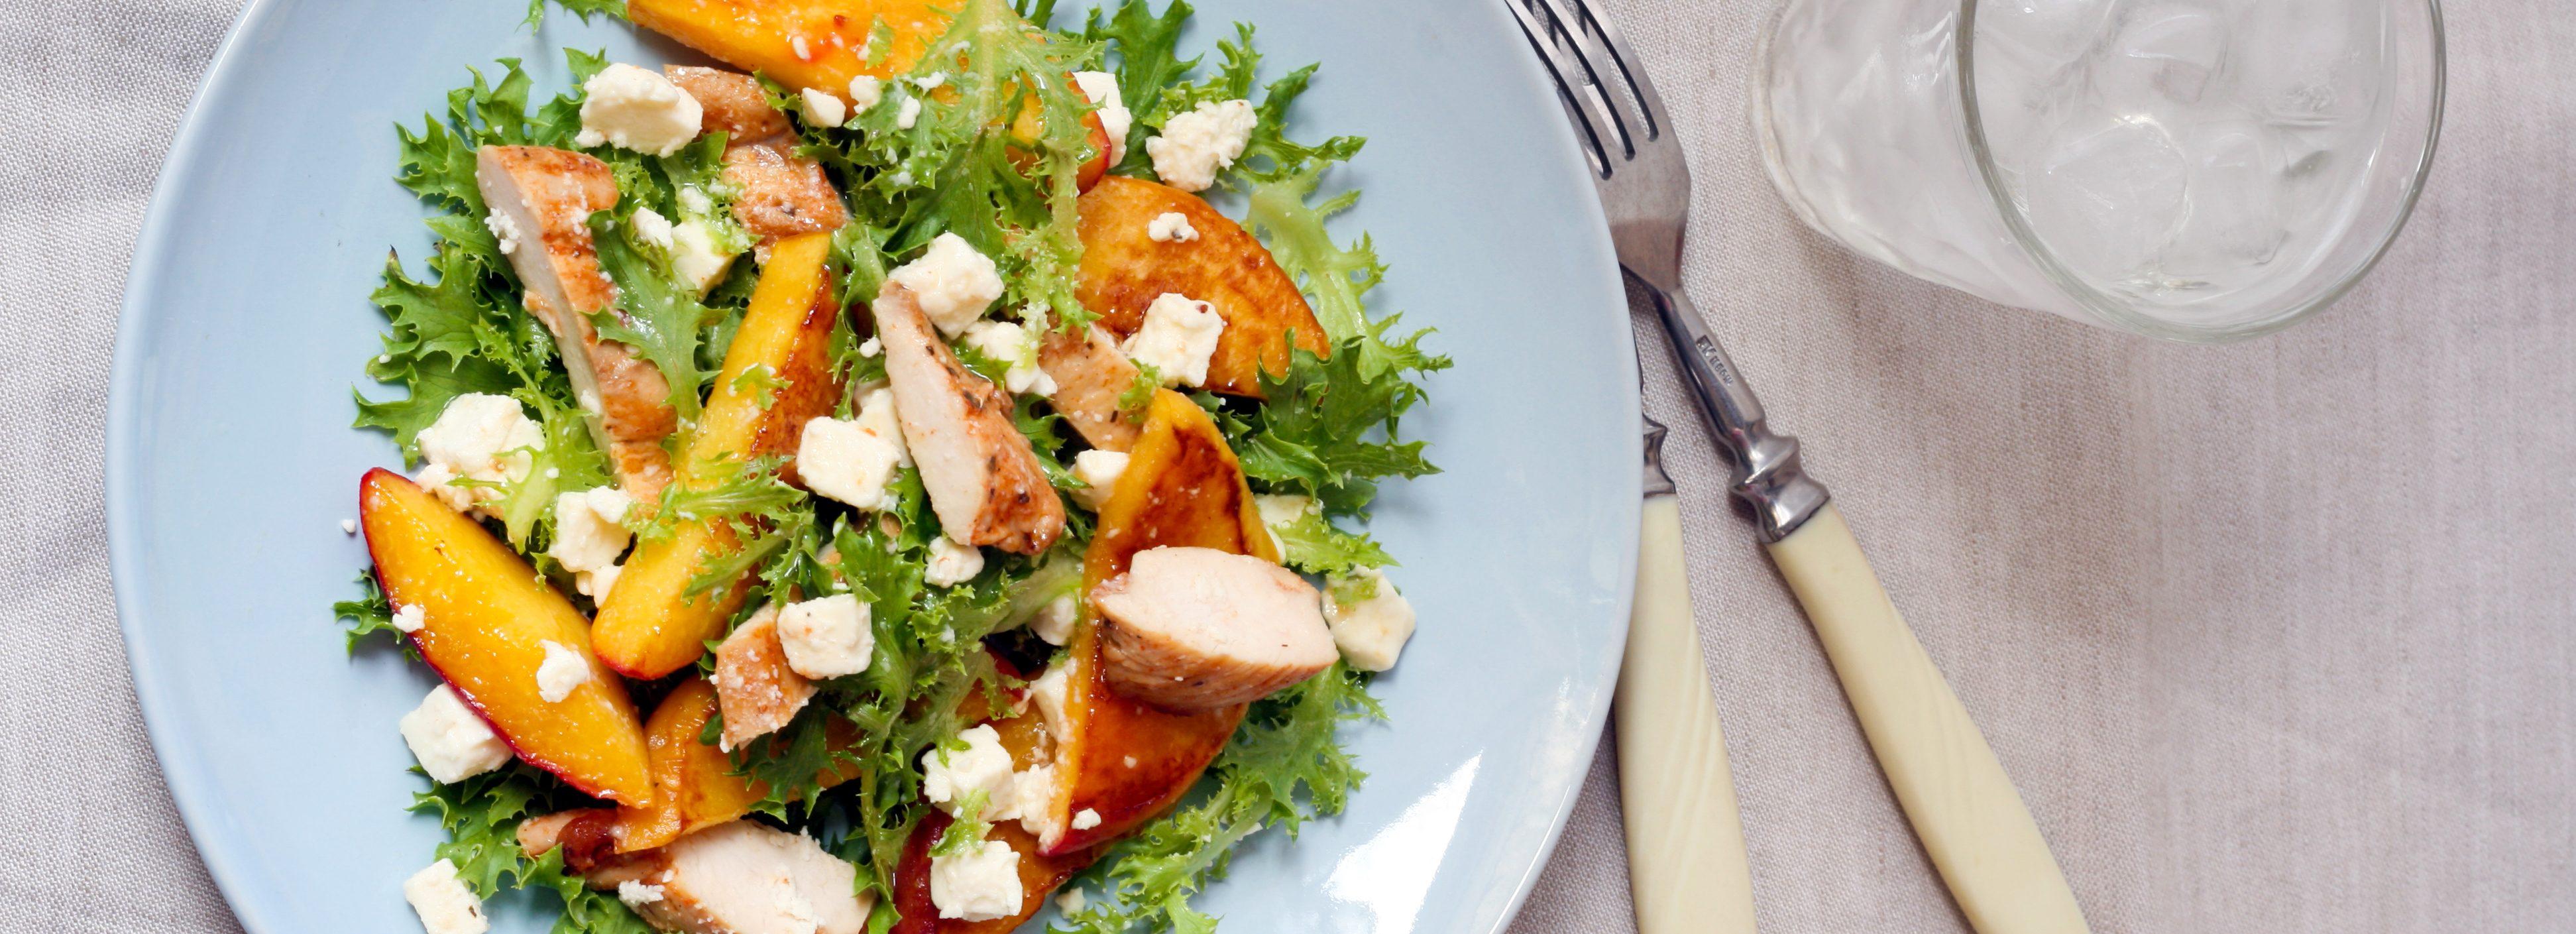 Peachy Chicken Salad With Fayrouz Peach